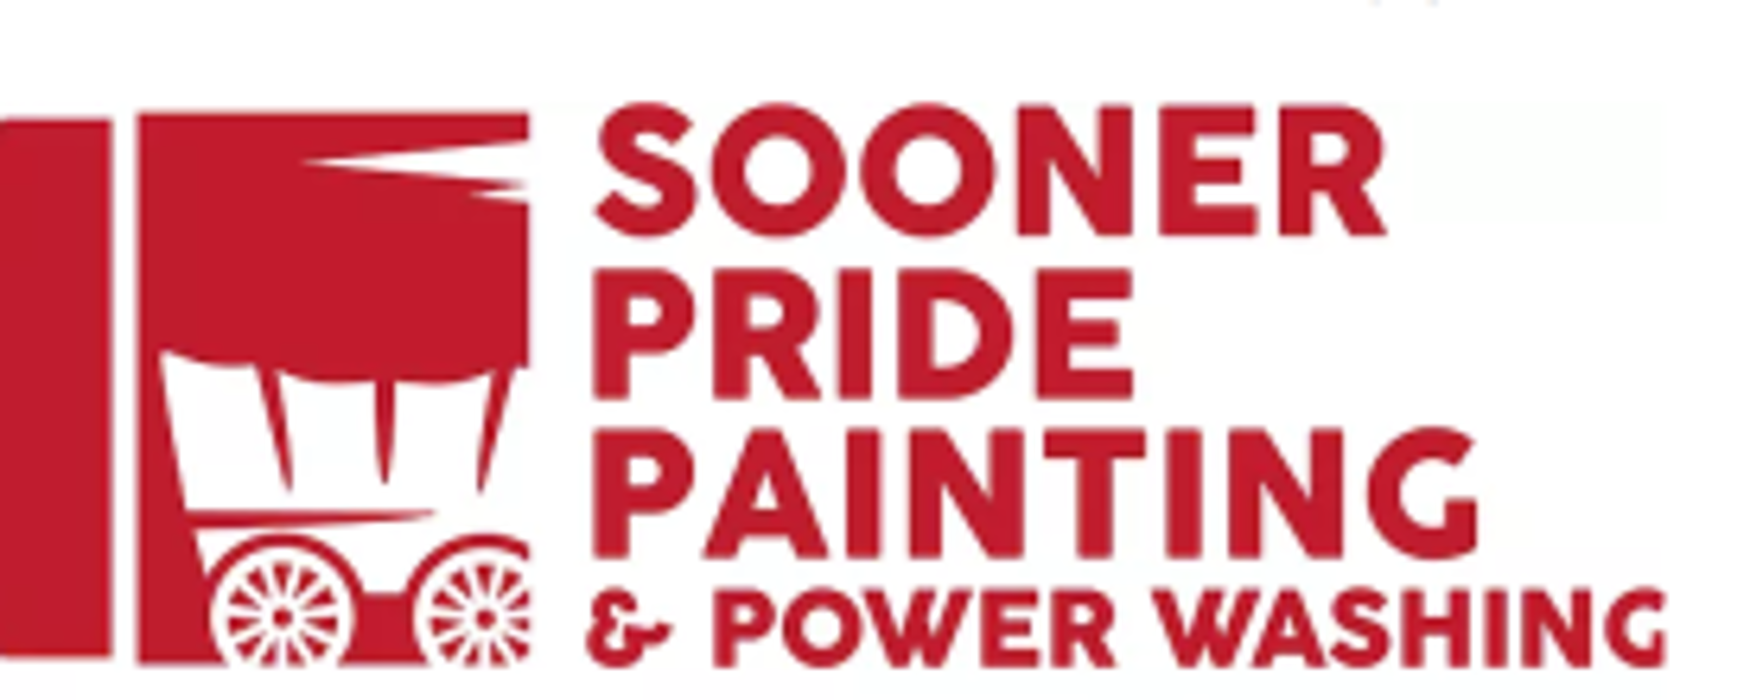 Sooner Pride Painting & Power Washing - Oklahoma City, OK